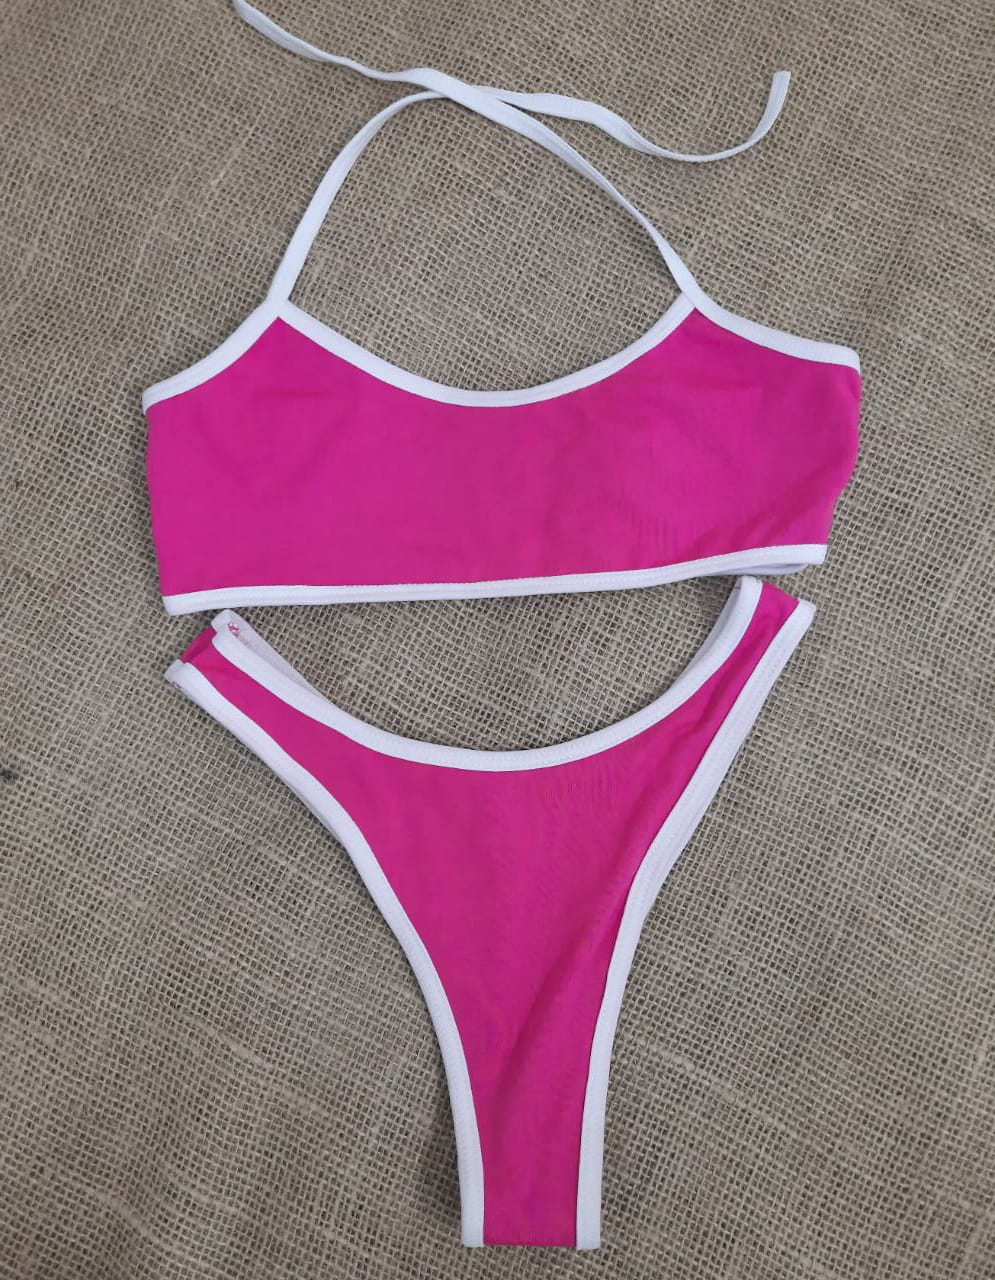 Biquíni reto amarra Nathalie rosa pink